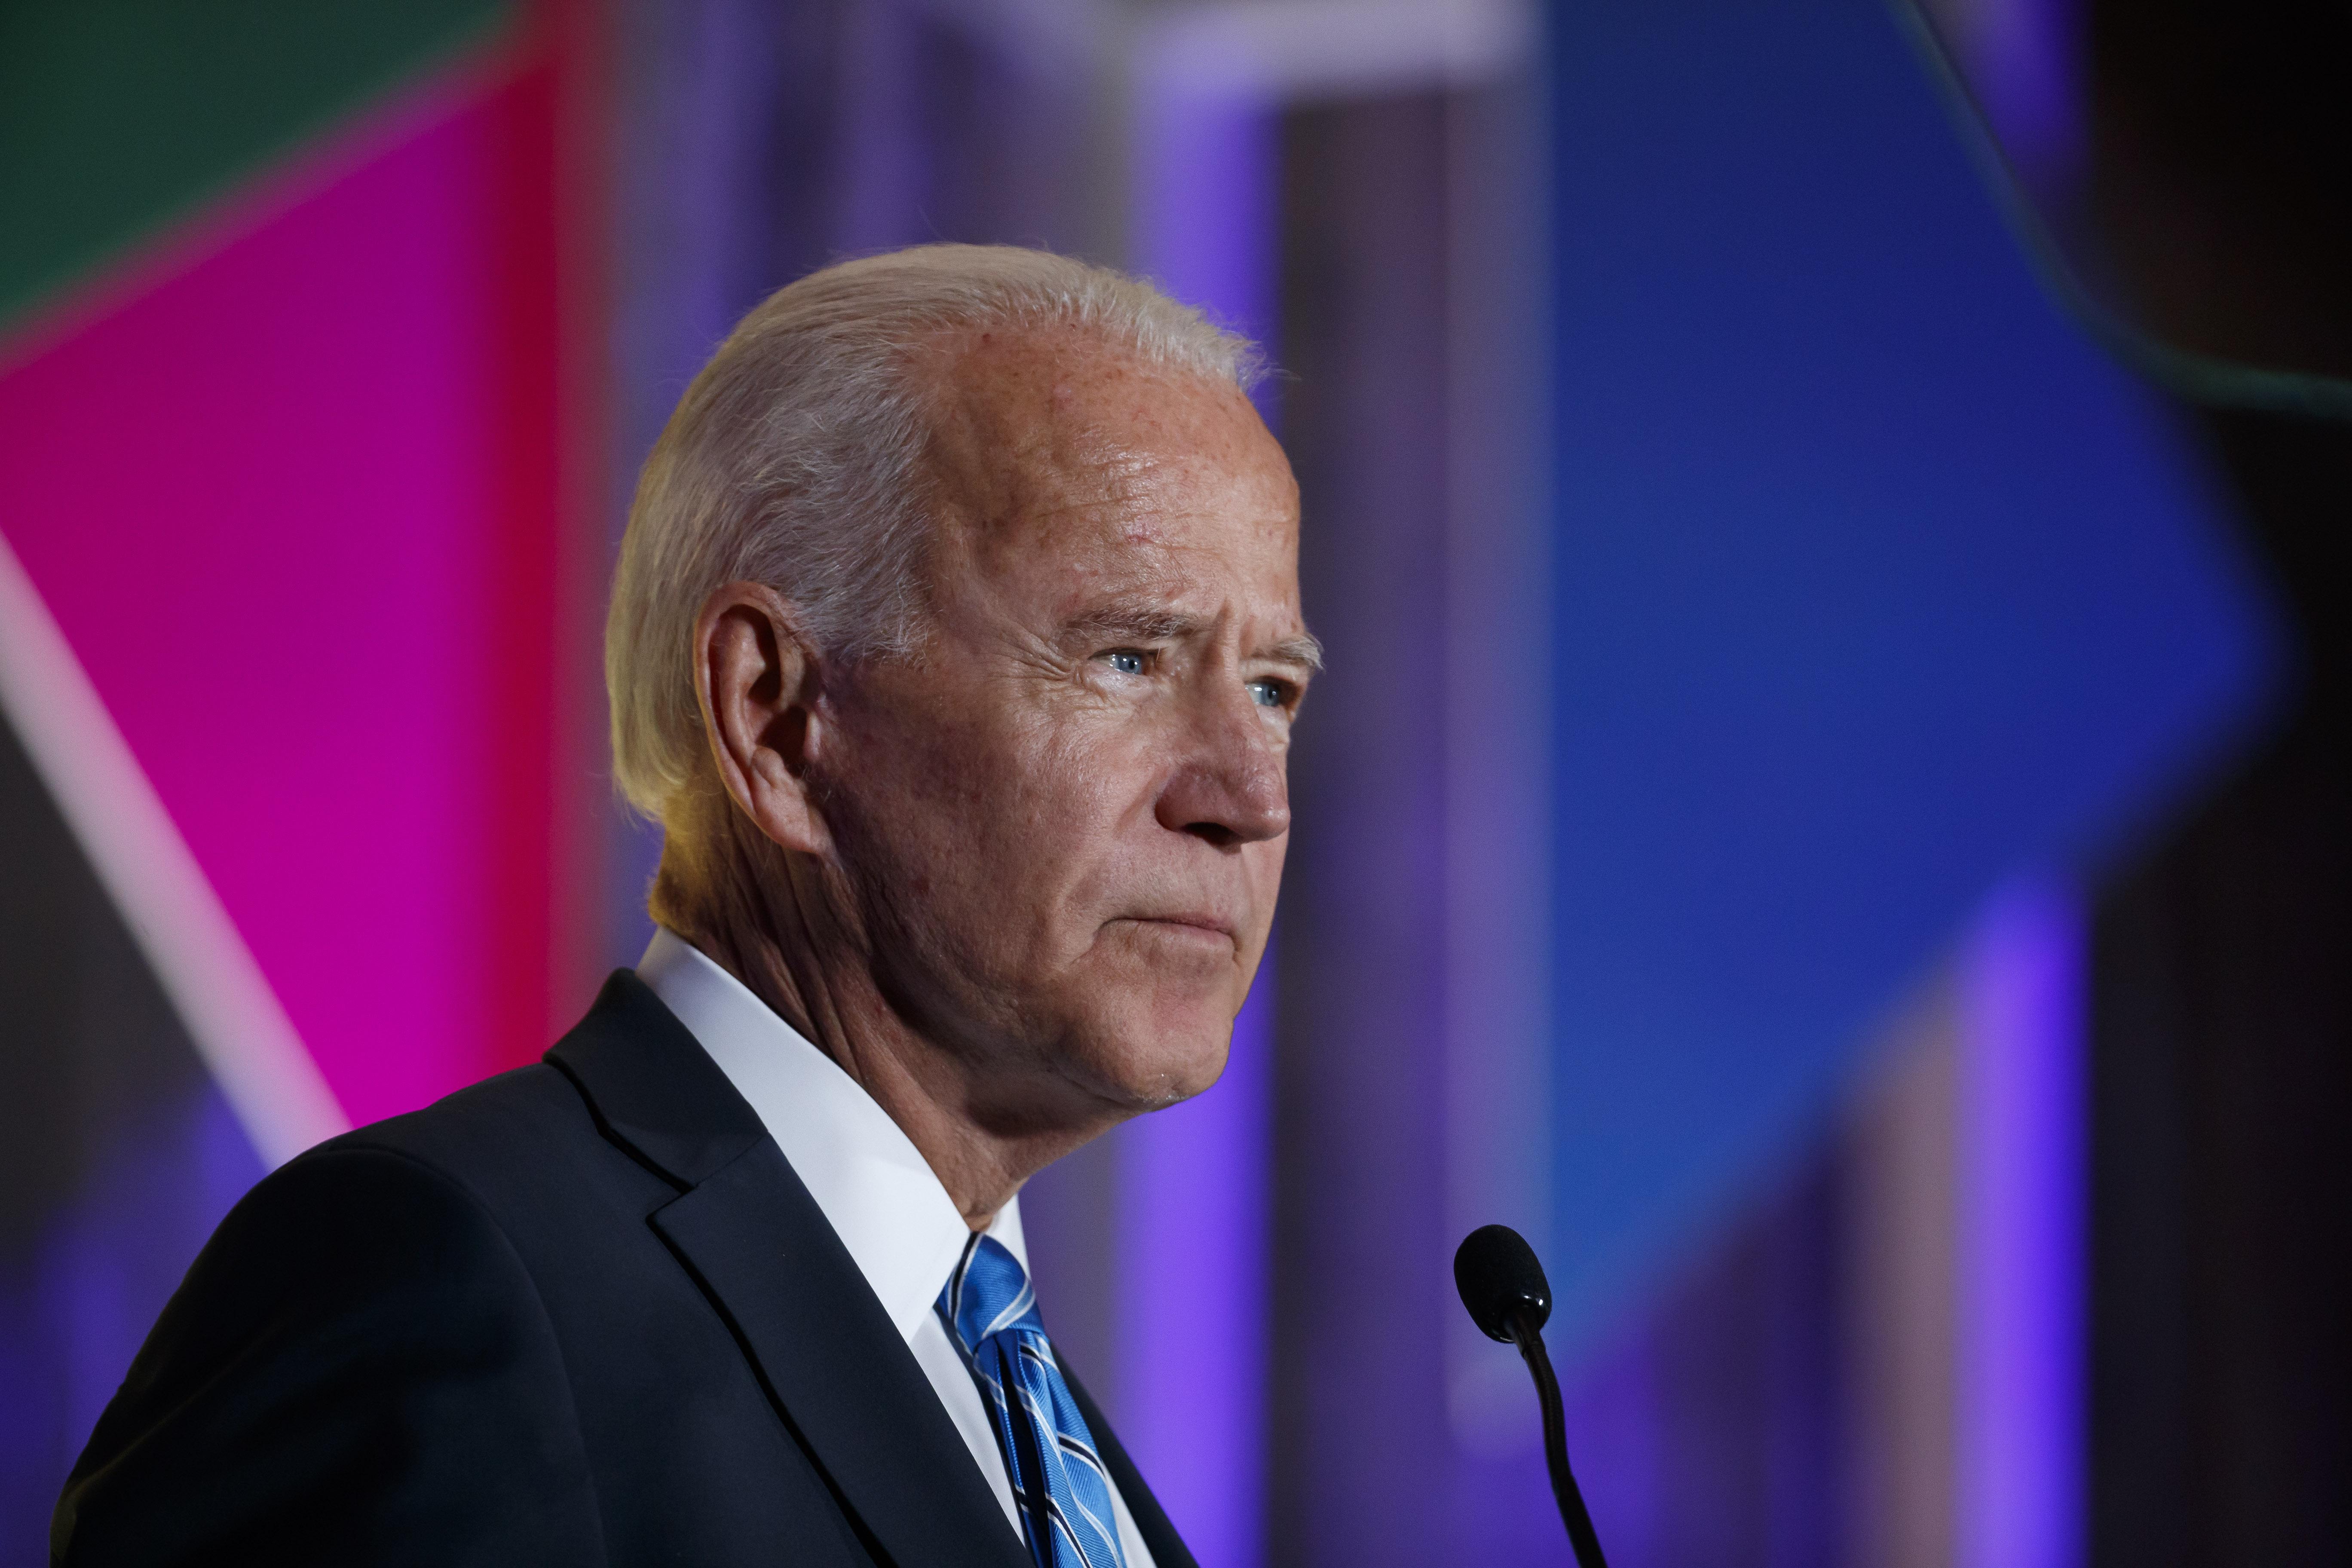 Joe Biden S False Claim About Drunken Driver Draws Renewed Scrutiny Washington Times